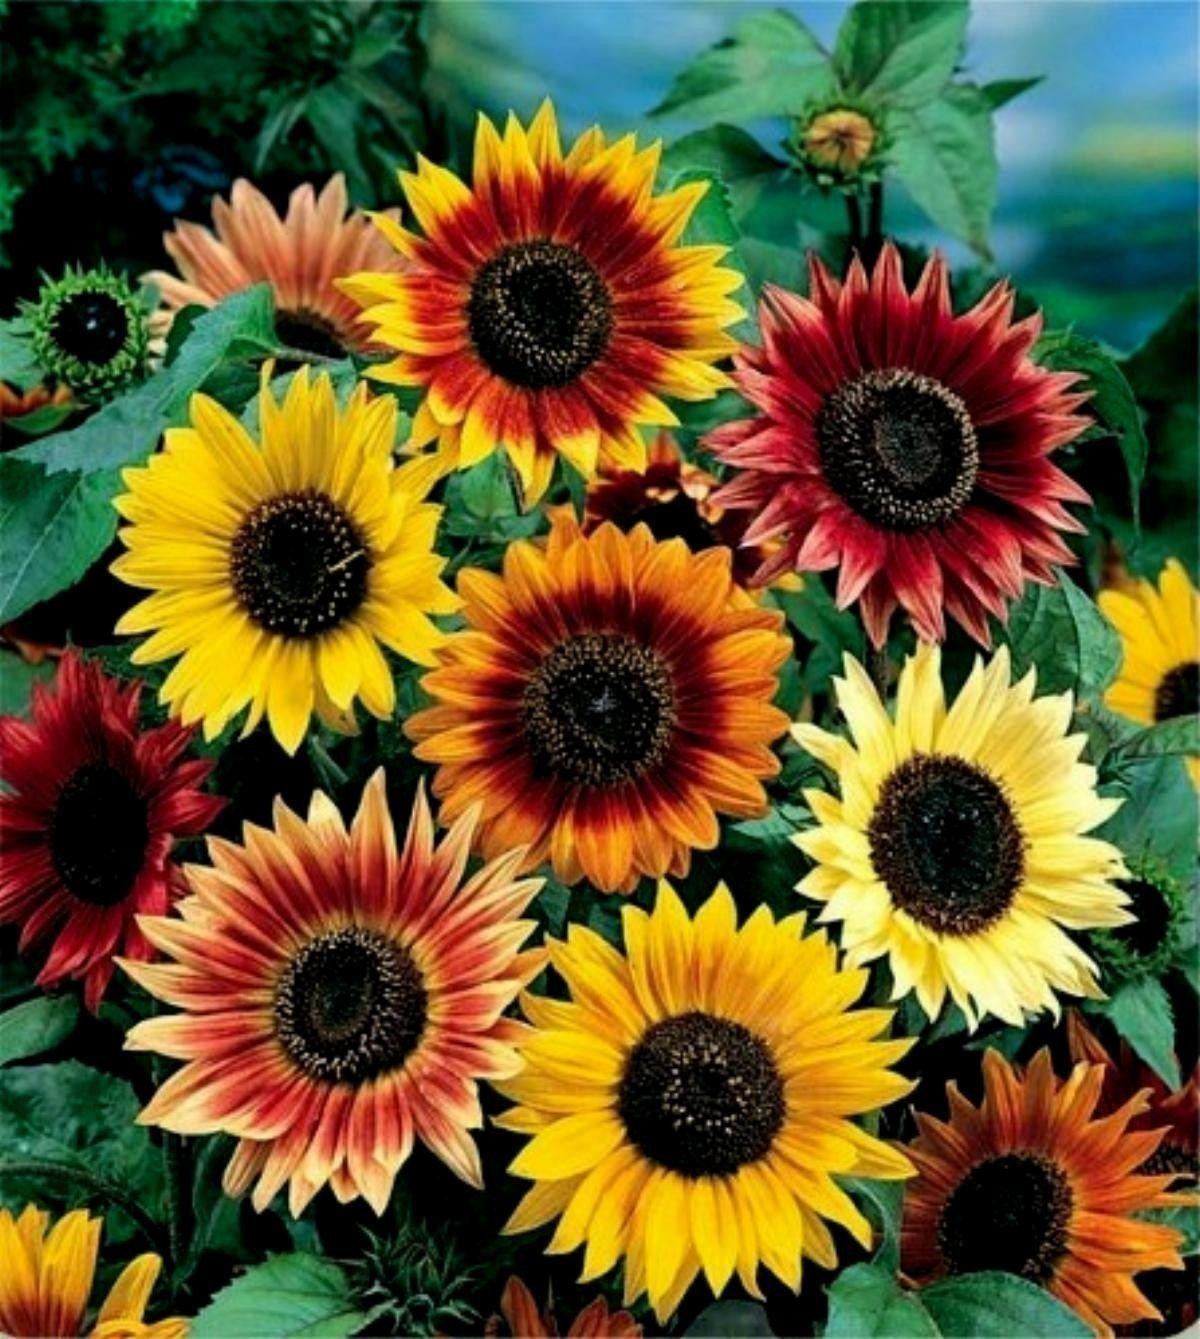 Garden Sunflower Seeds Multi Color Planting Sunflowers Dwarf Sunflowers Flower Seeds